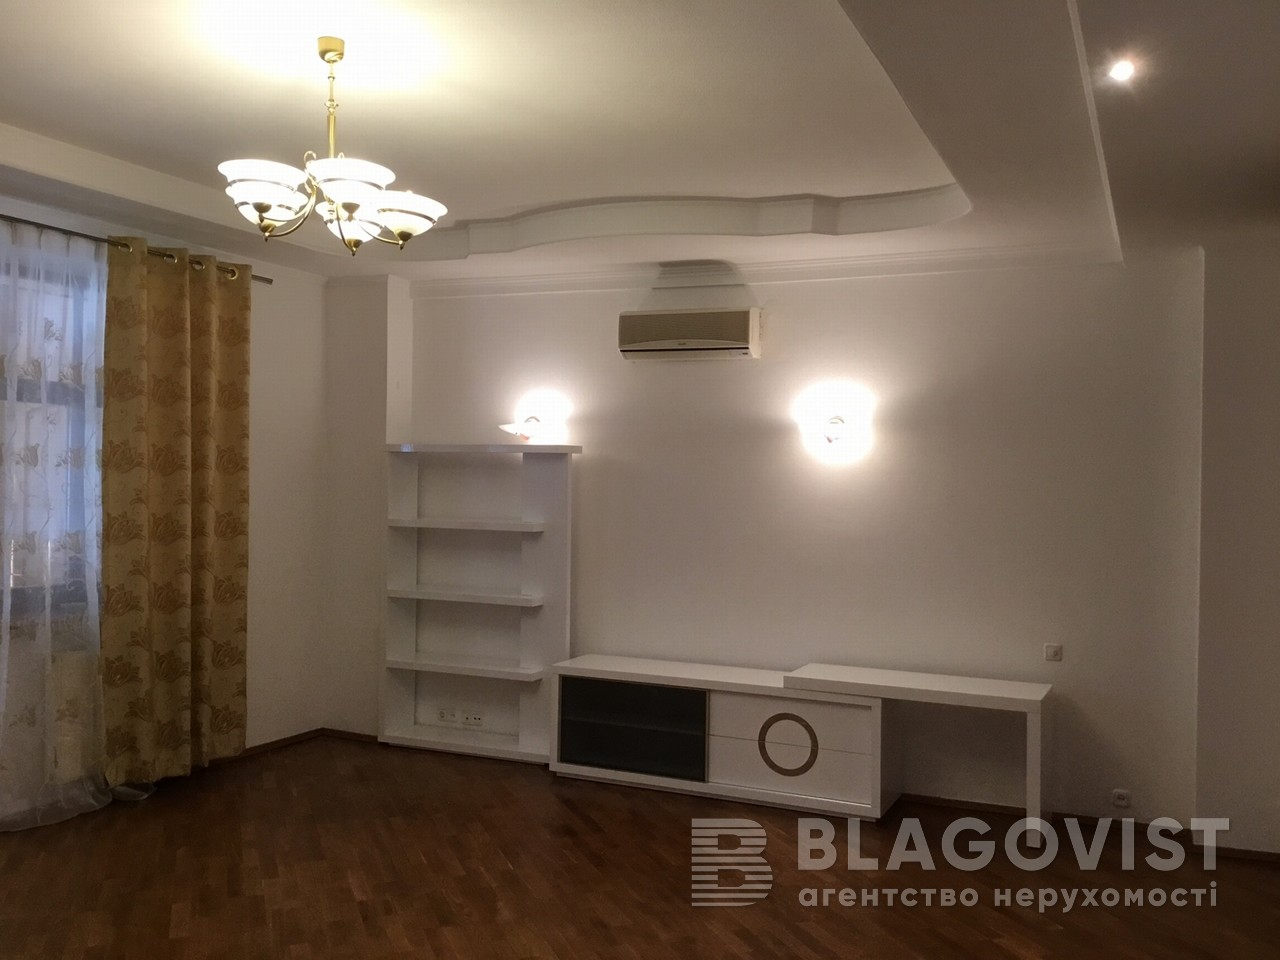 Квартира C-72808, Павловская, 18, Киев - Фото 8